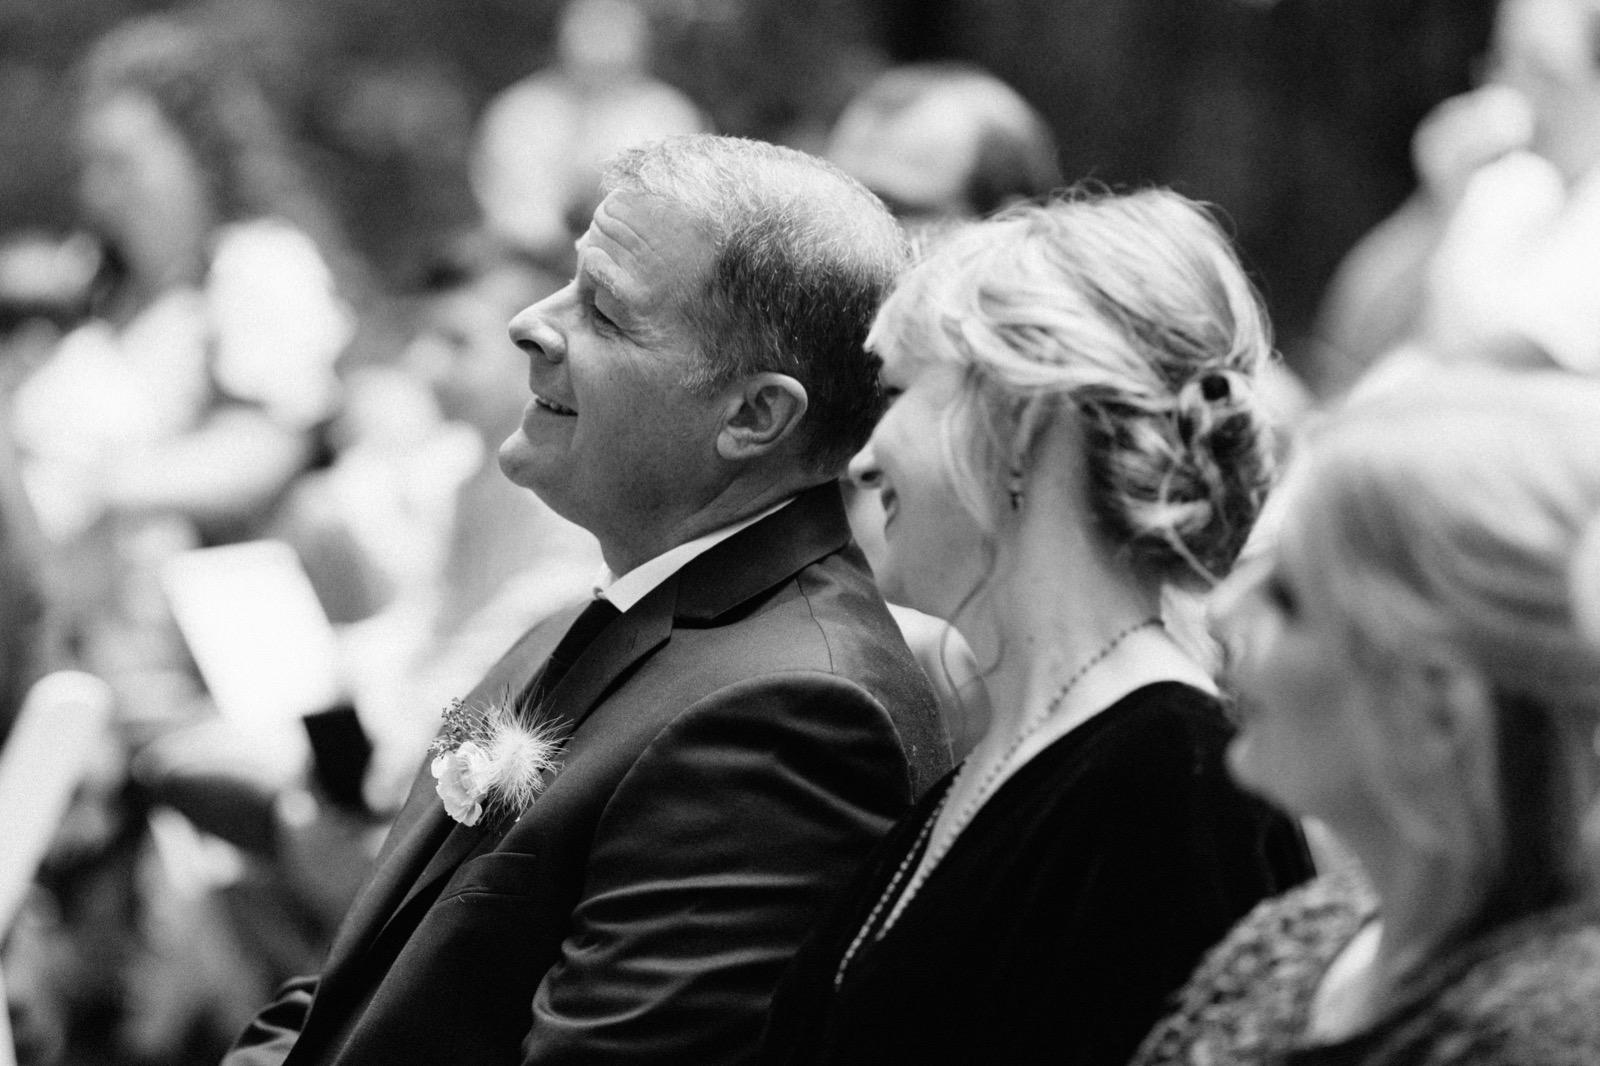 068_Emily & Jeff Wedding 0650_the-waterfall-lodge_forest_wedding_ben-lomond_intimate